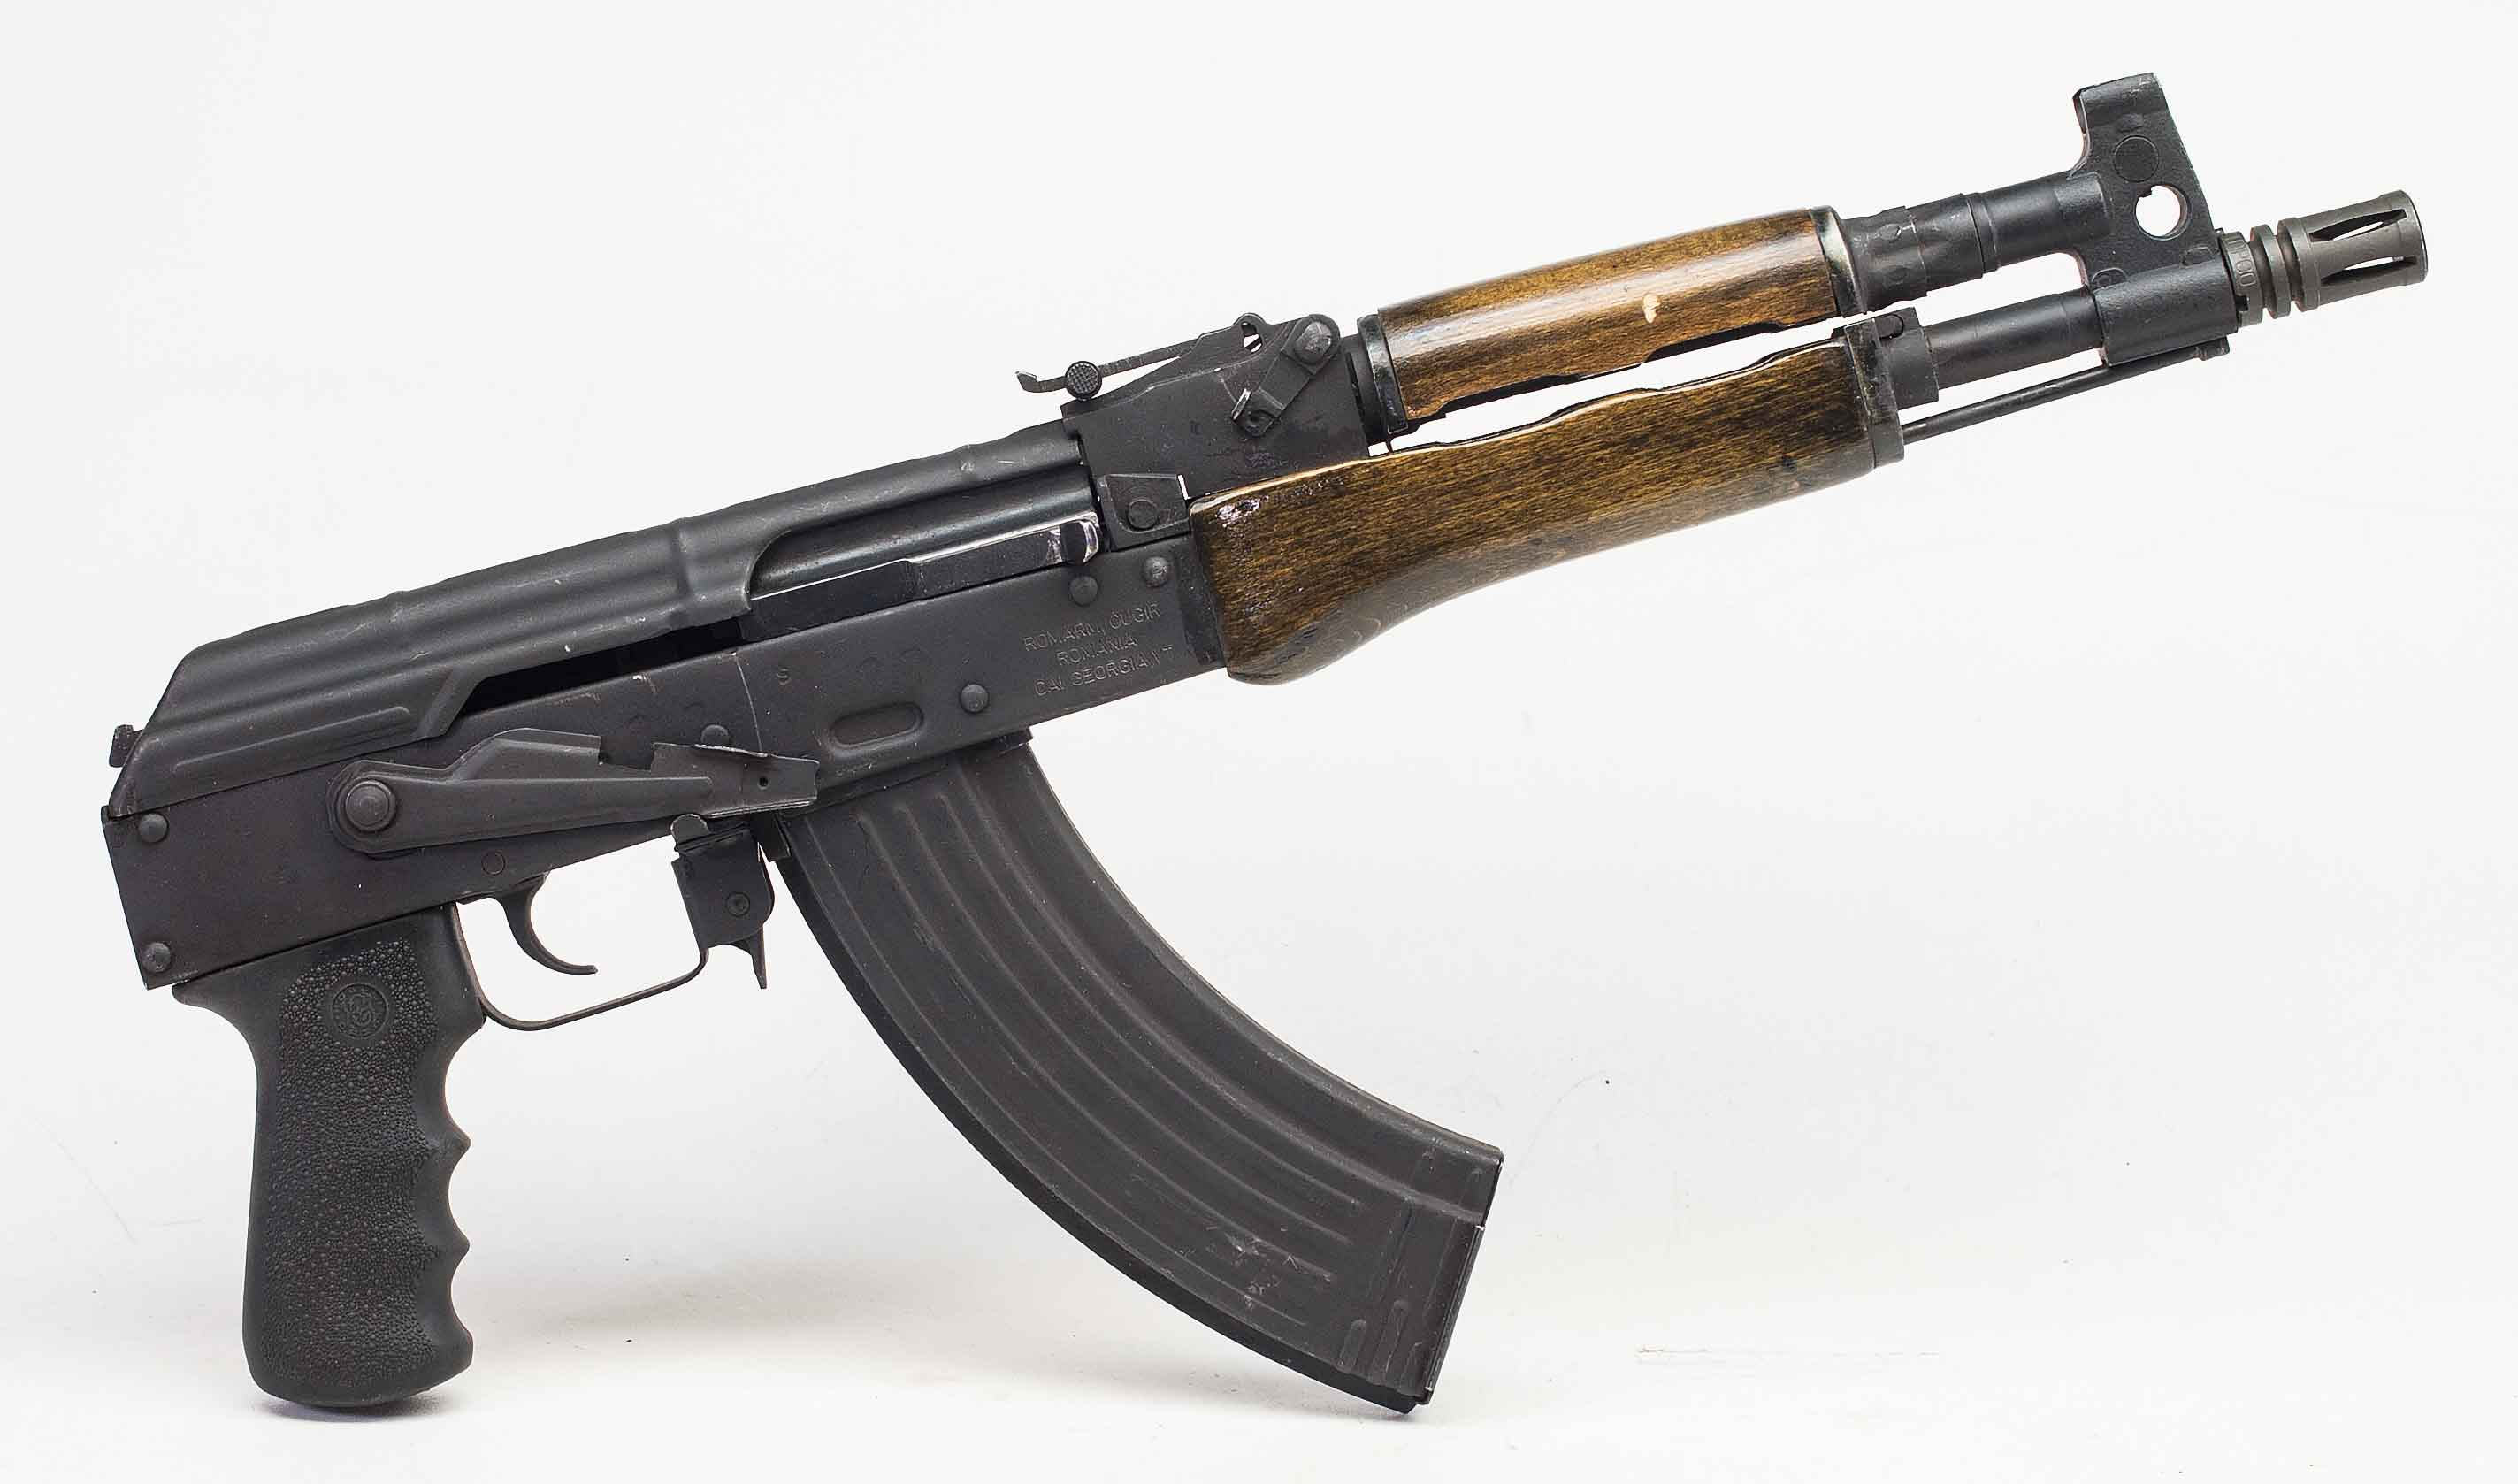 ROMARM DRACO AK47 PISTOL (Auction ID: 10594597, End Time